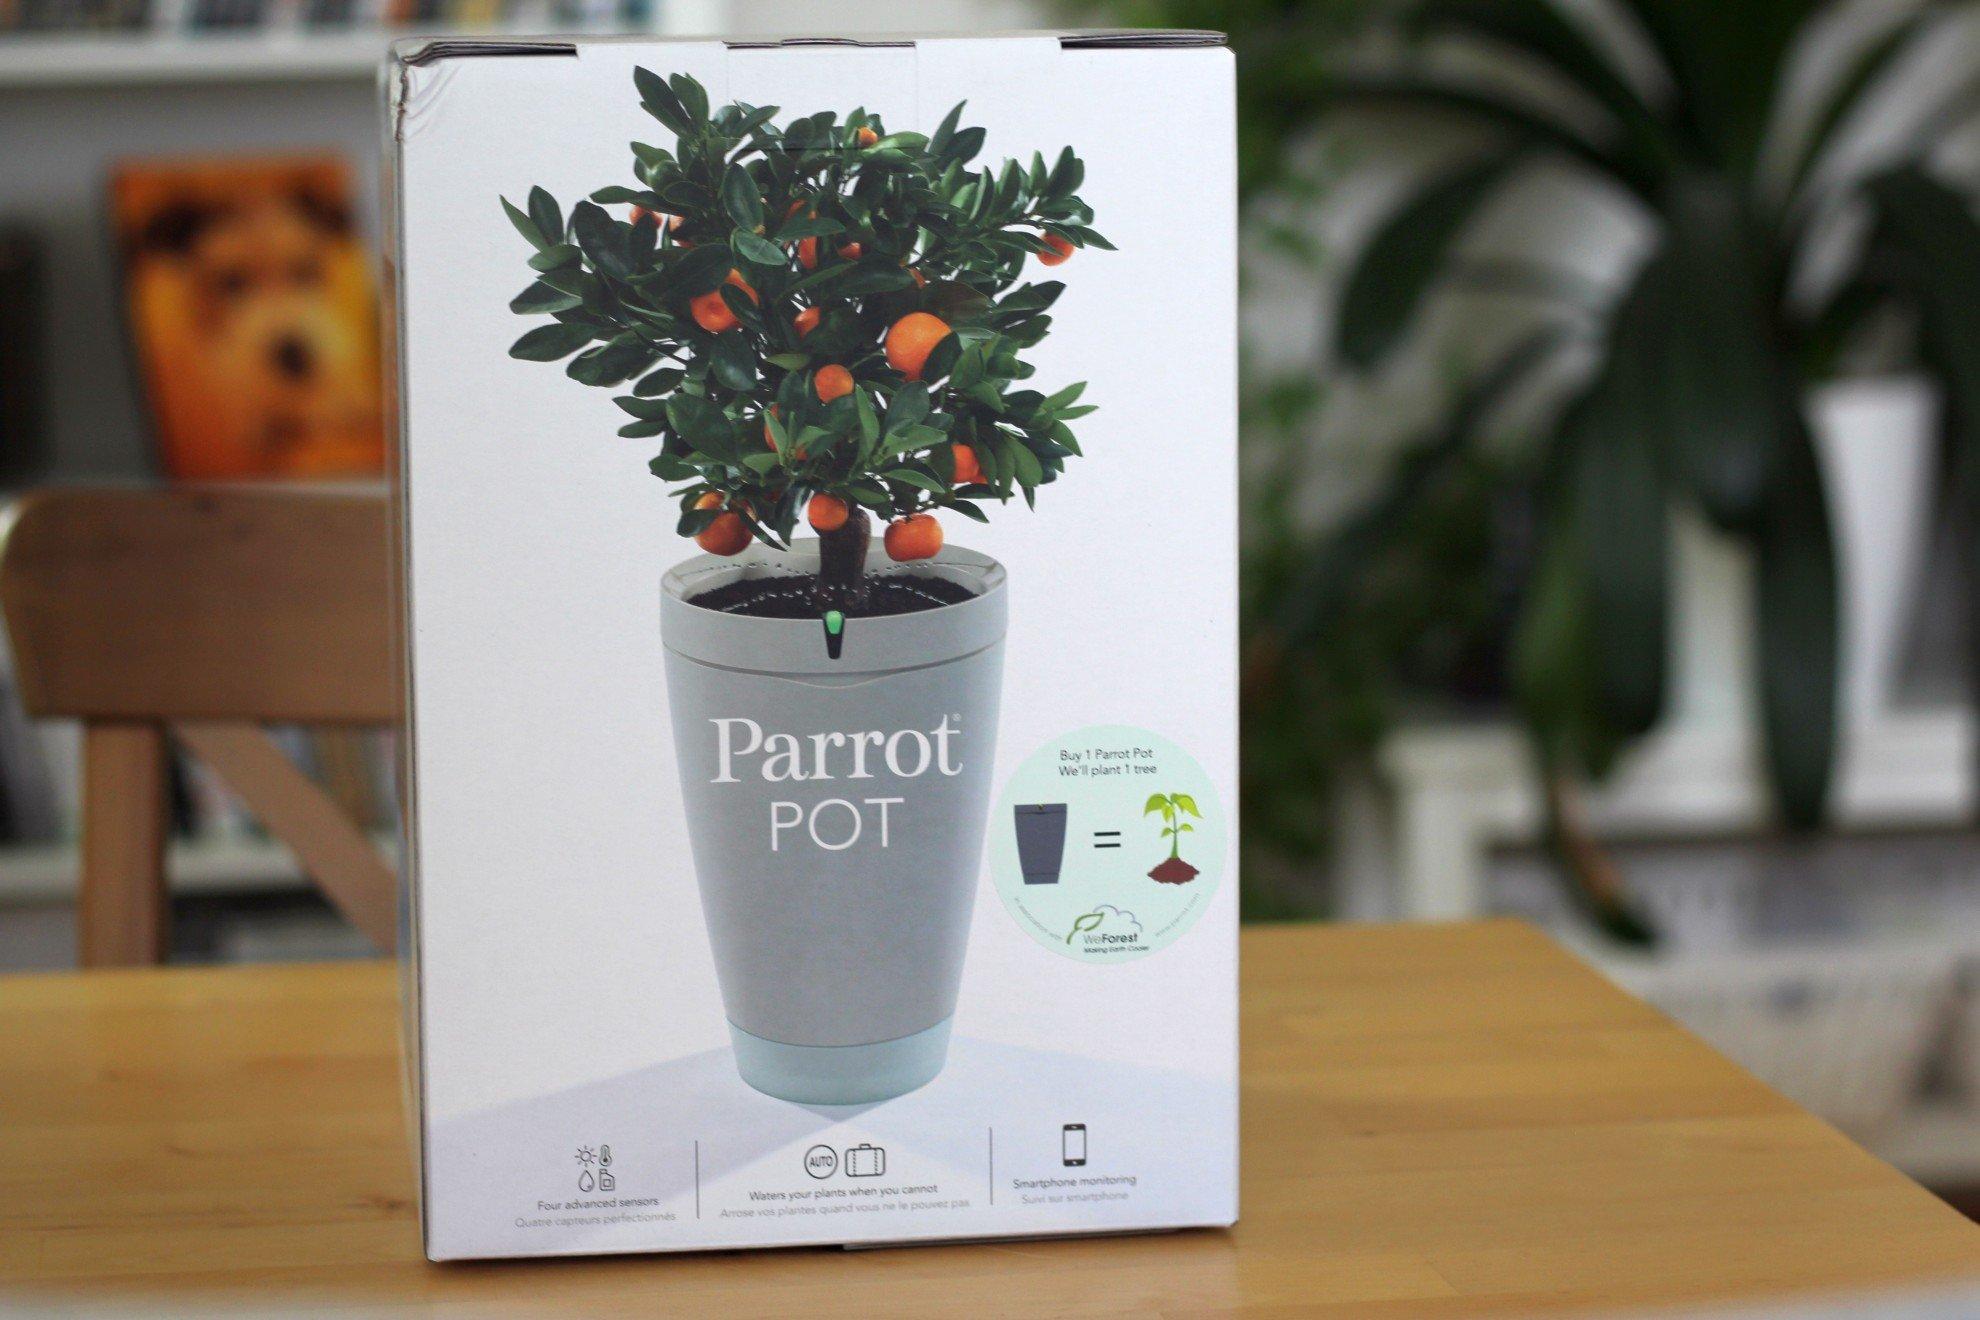 Parrot pot so funktioniert der intelligente blumentopf euronics trendblog - Wochenspiegel marktplatz ...